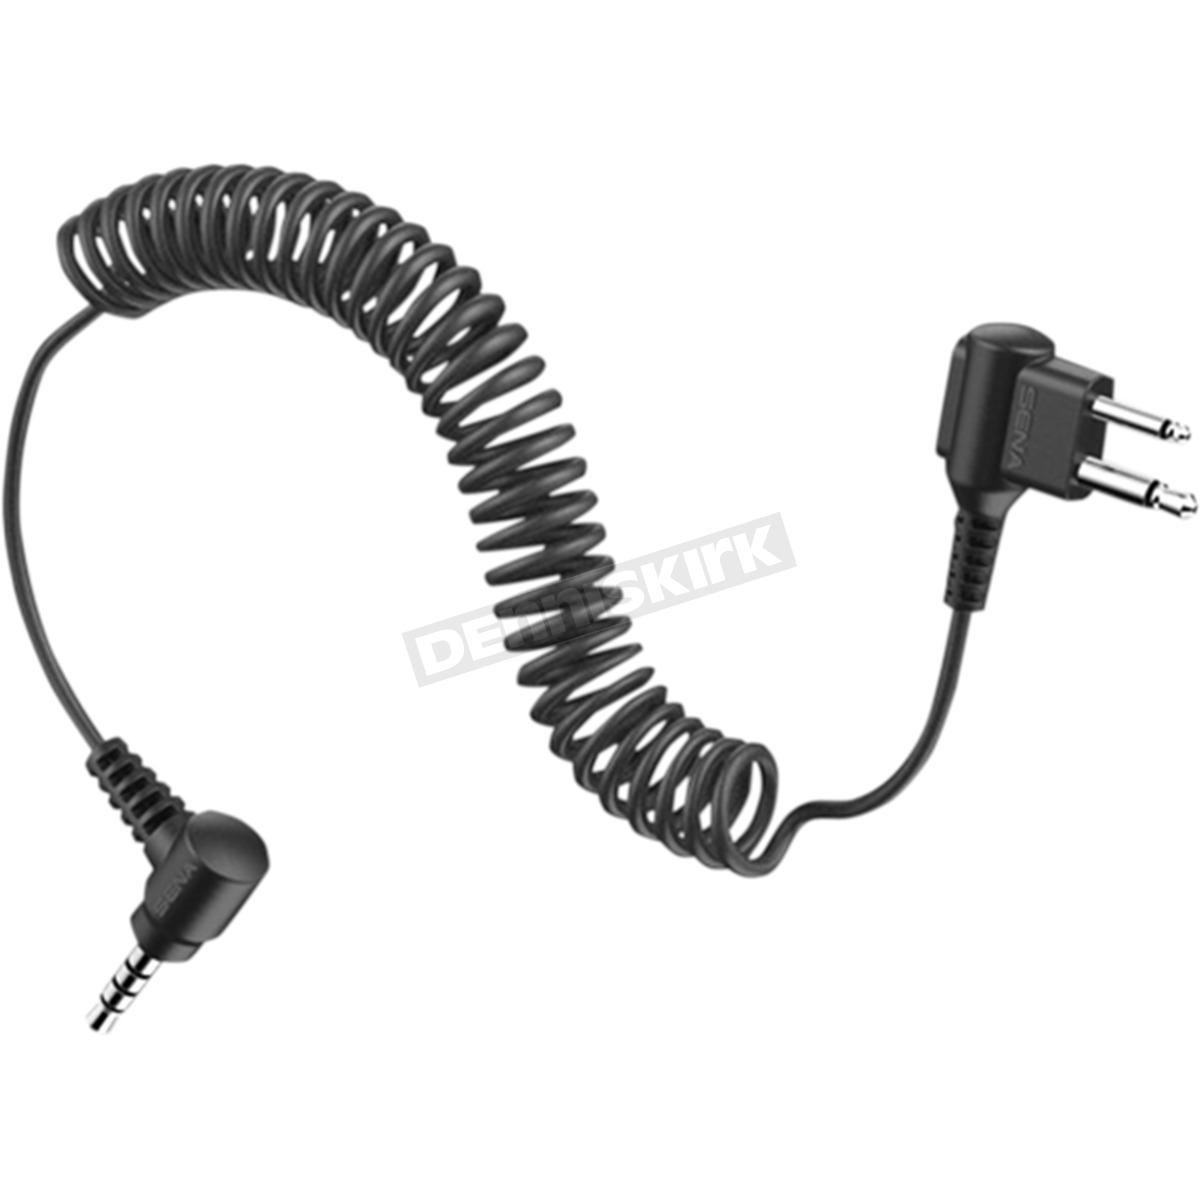 Sena 2 Way Radio Cable For Motorola Twin Pin Connector